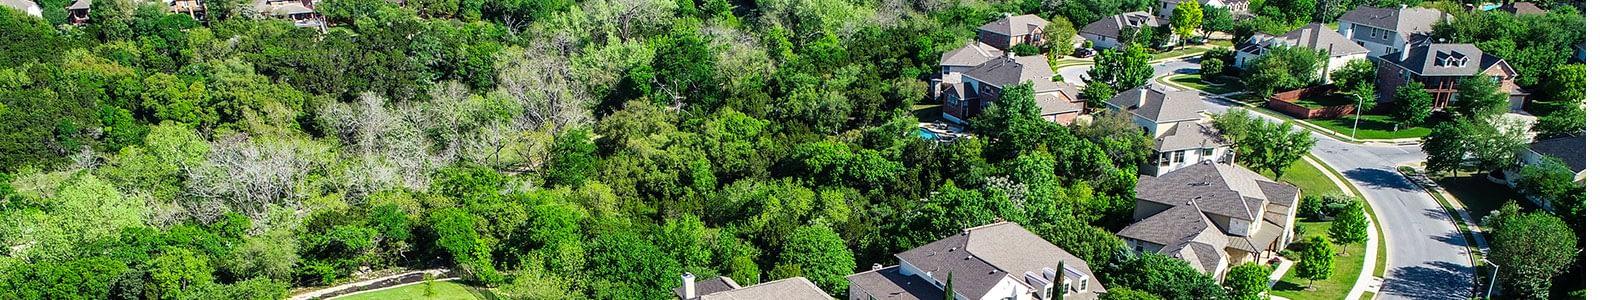 Dallas Tx Pest Control And Extermination Certified Termite Pest Control